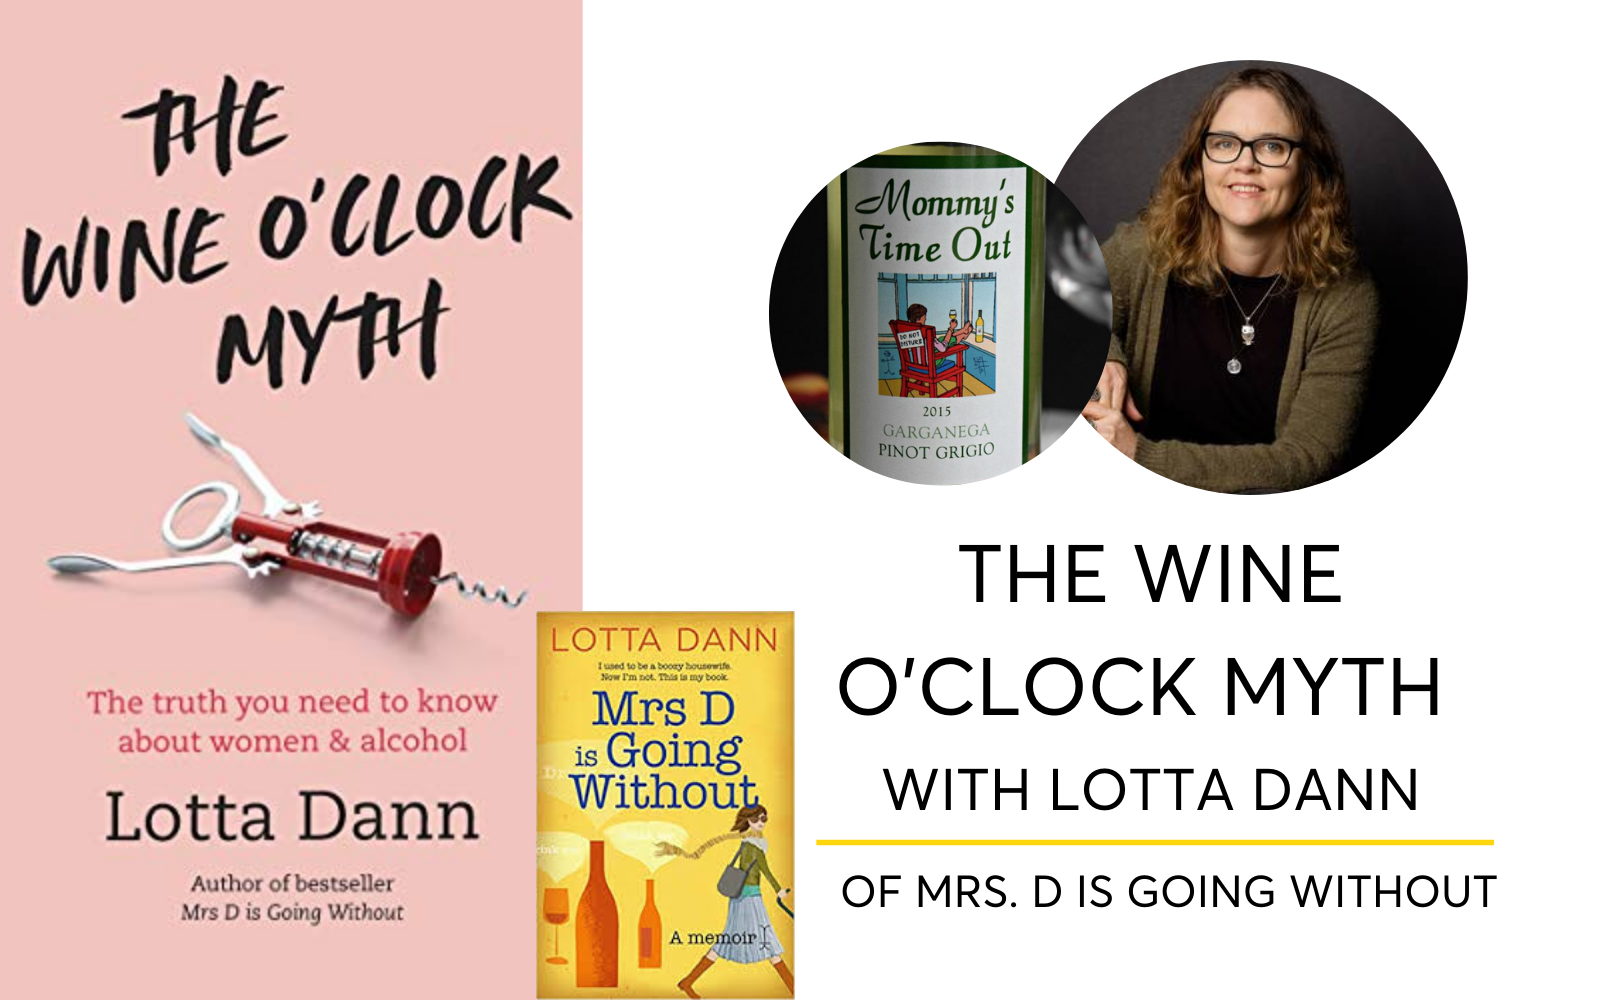 Wine O'clock With Lotta Dann